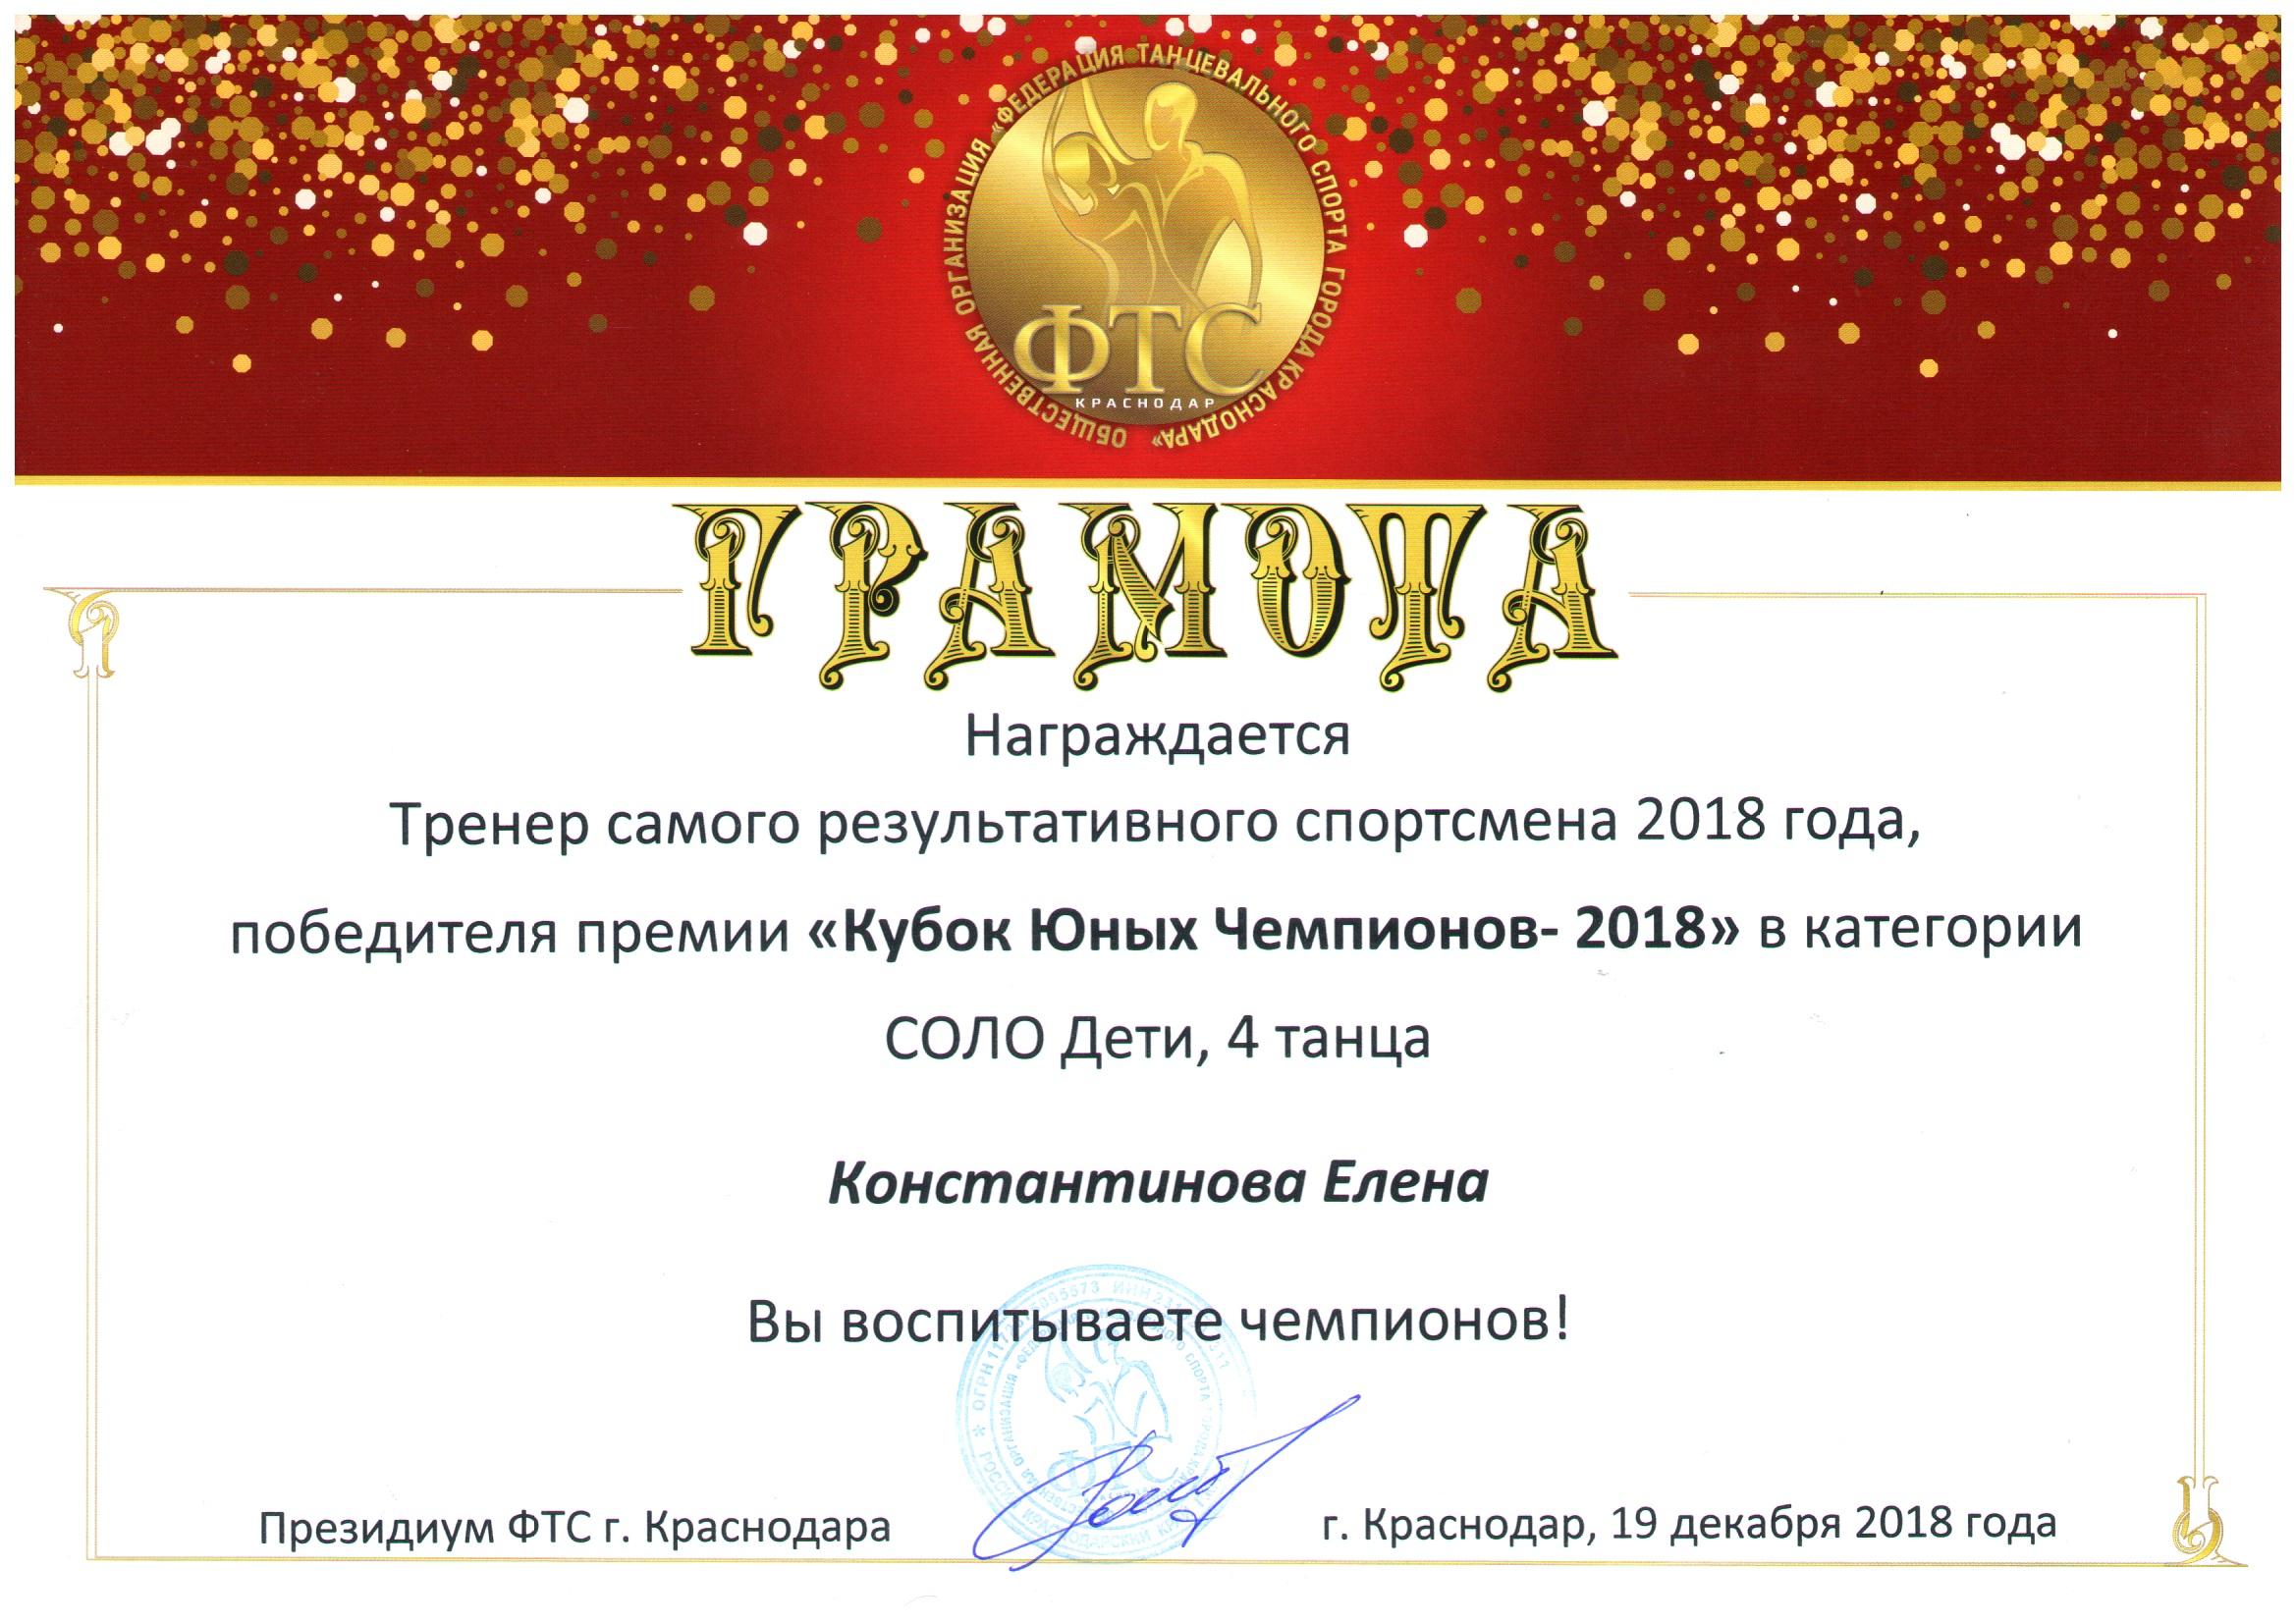 sertificate_13